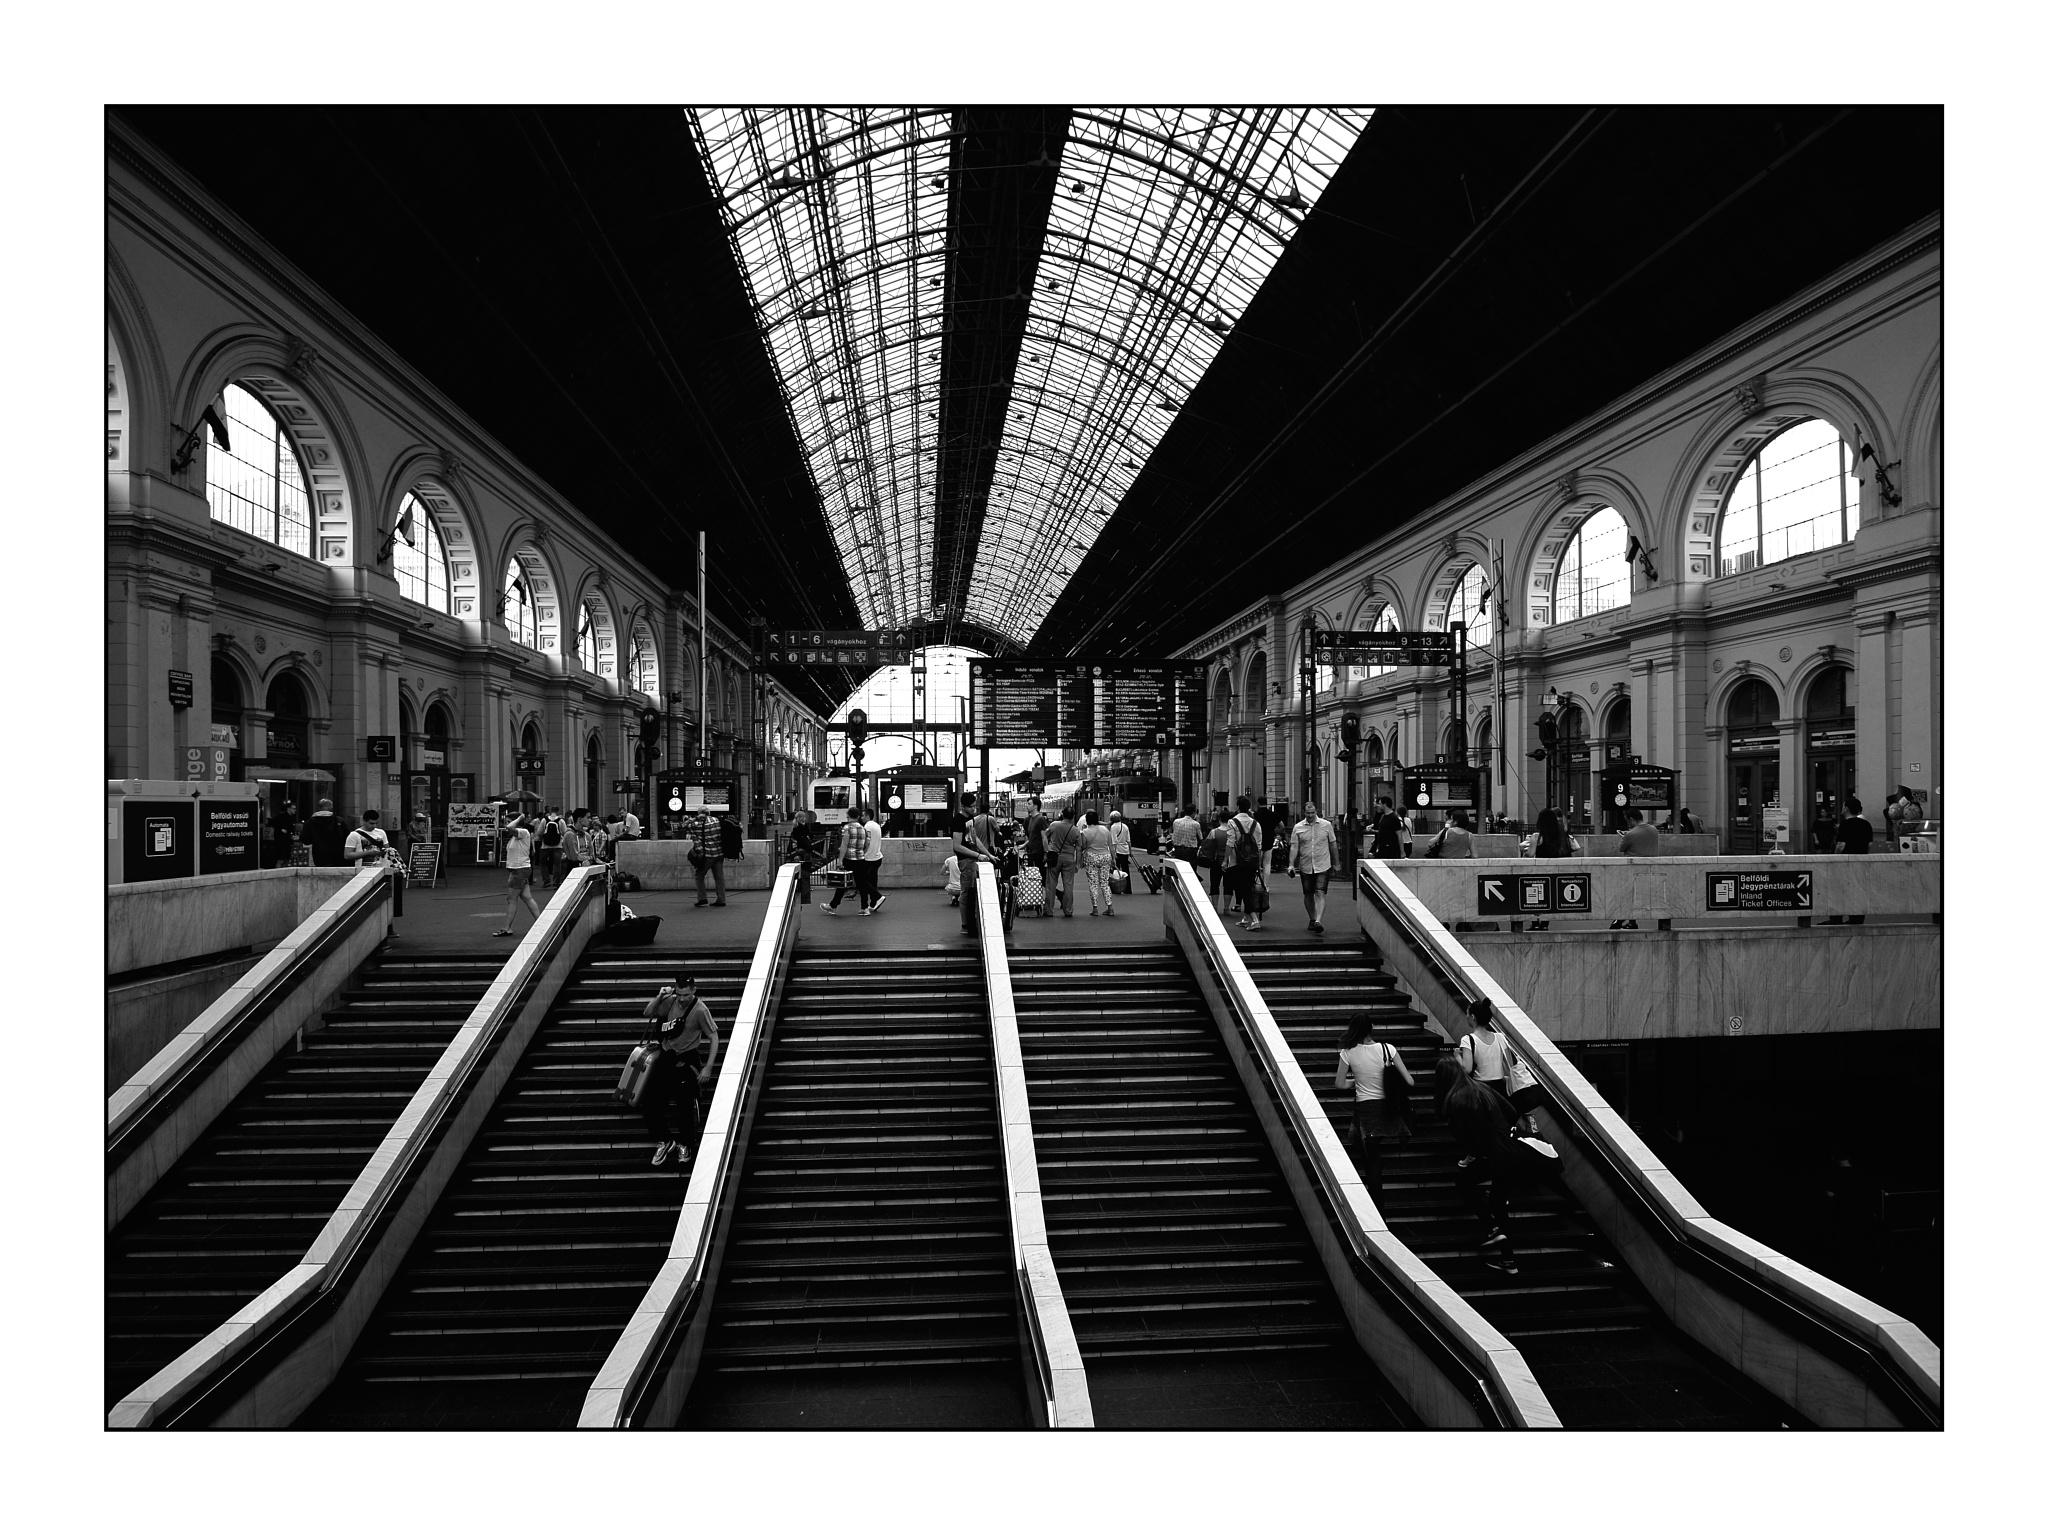 Keleti railway station by karlbertil